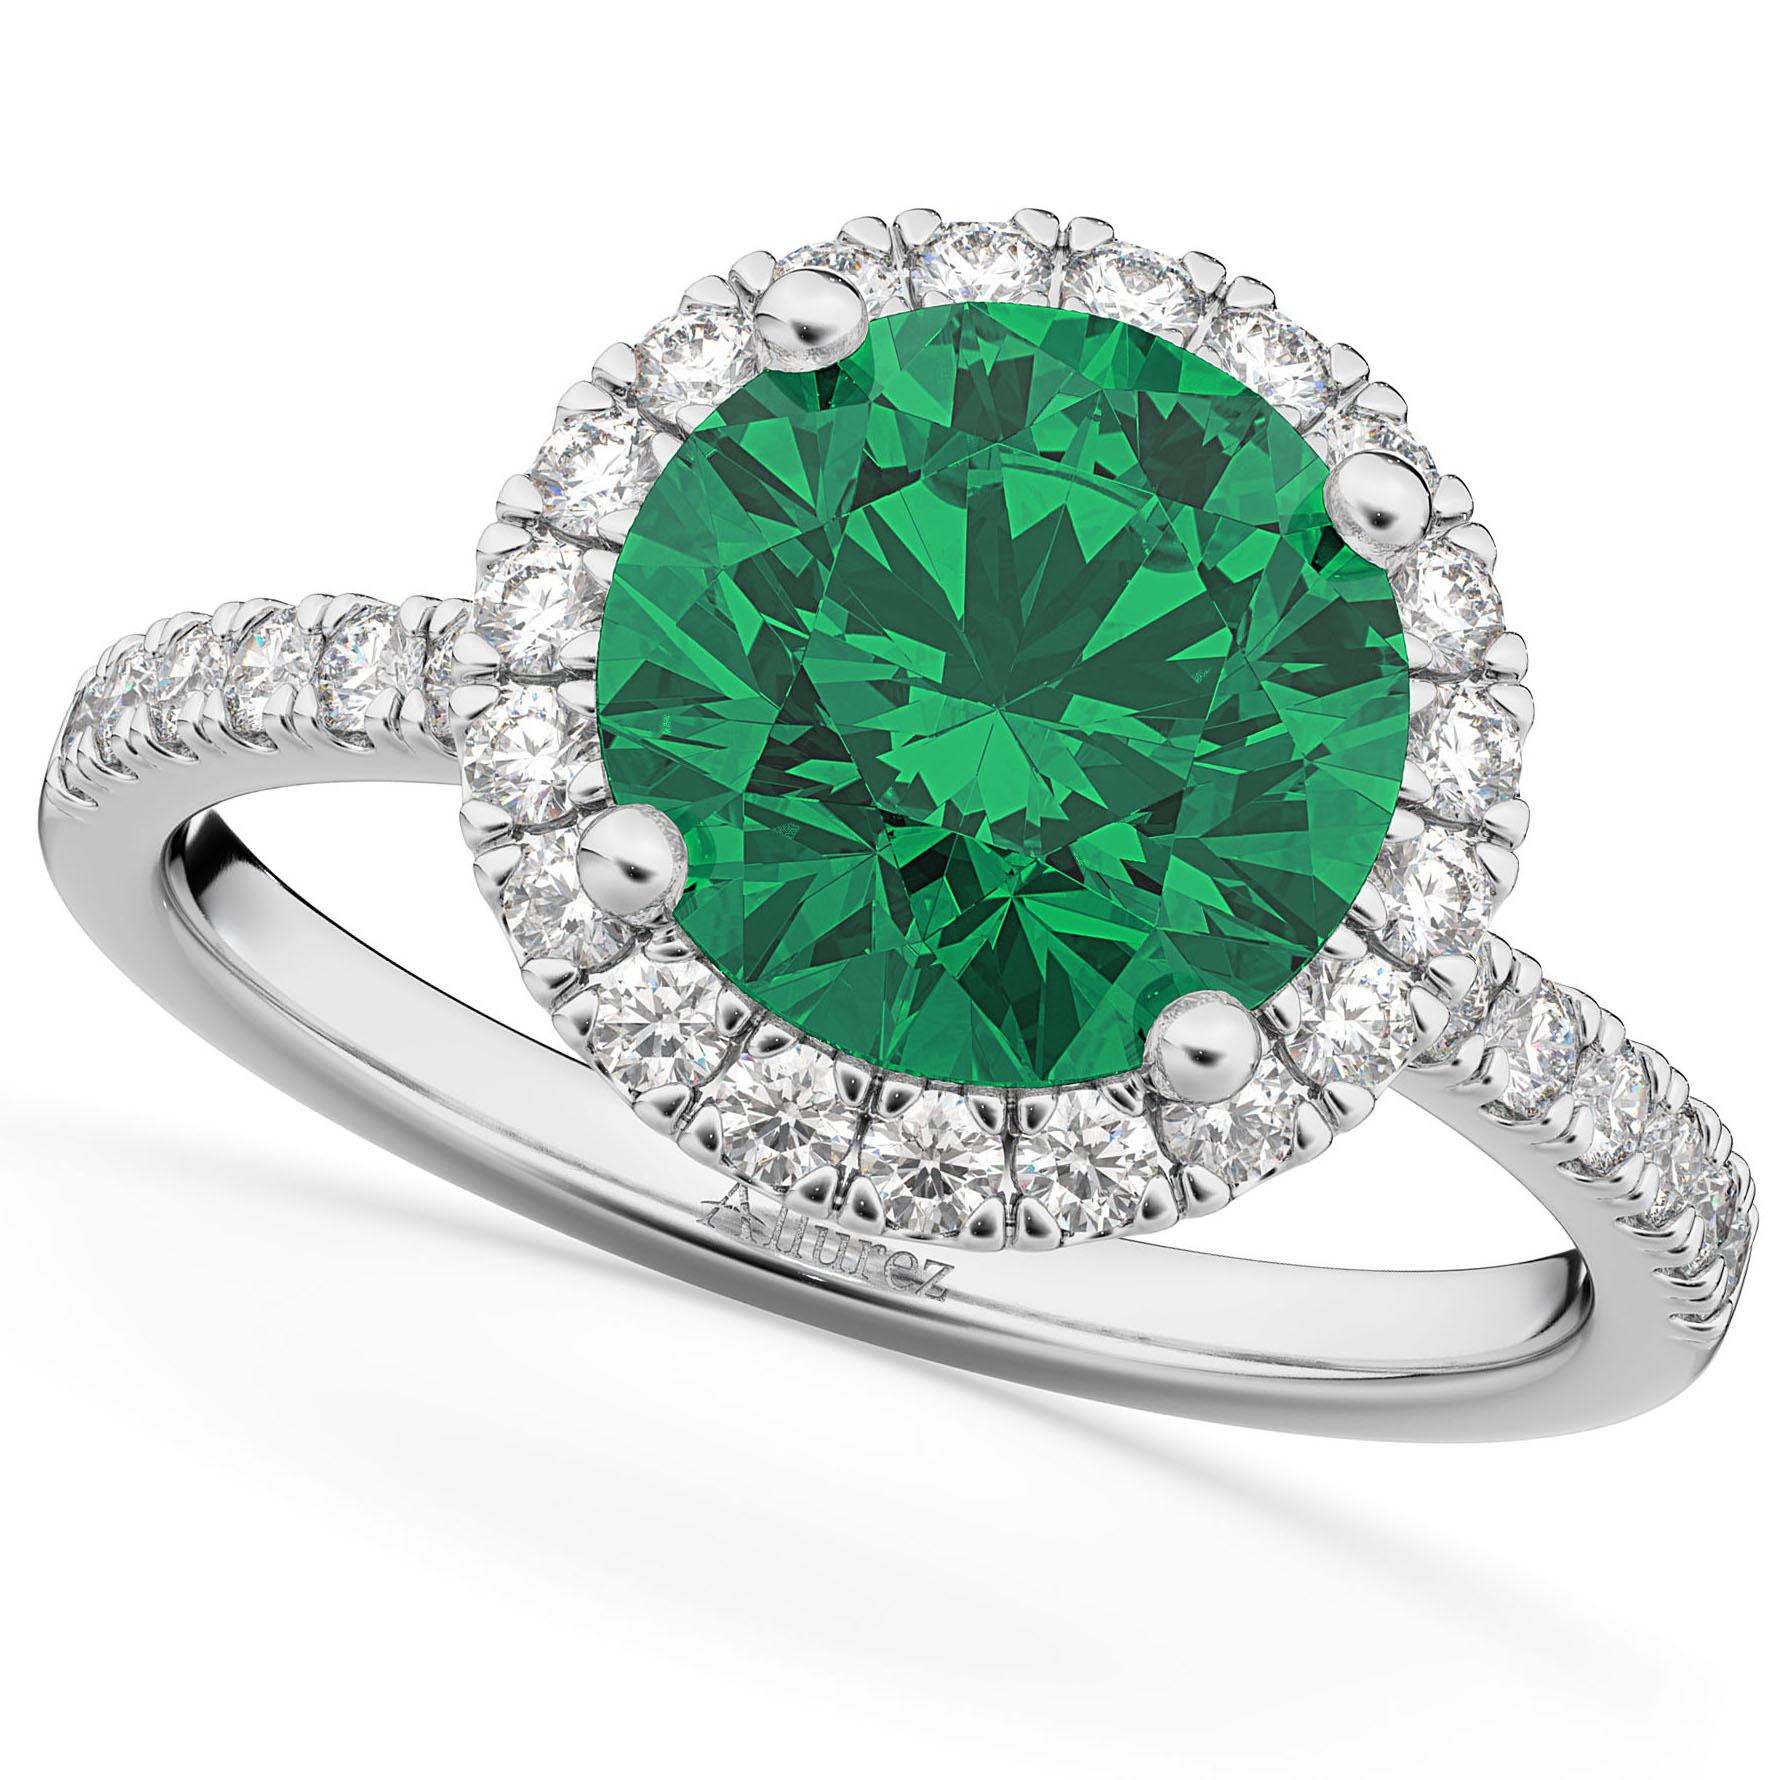 Halo Emerald & Diamond Engagement Ring 18K White Gold 2.80ct